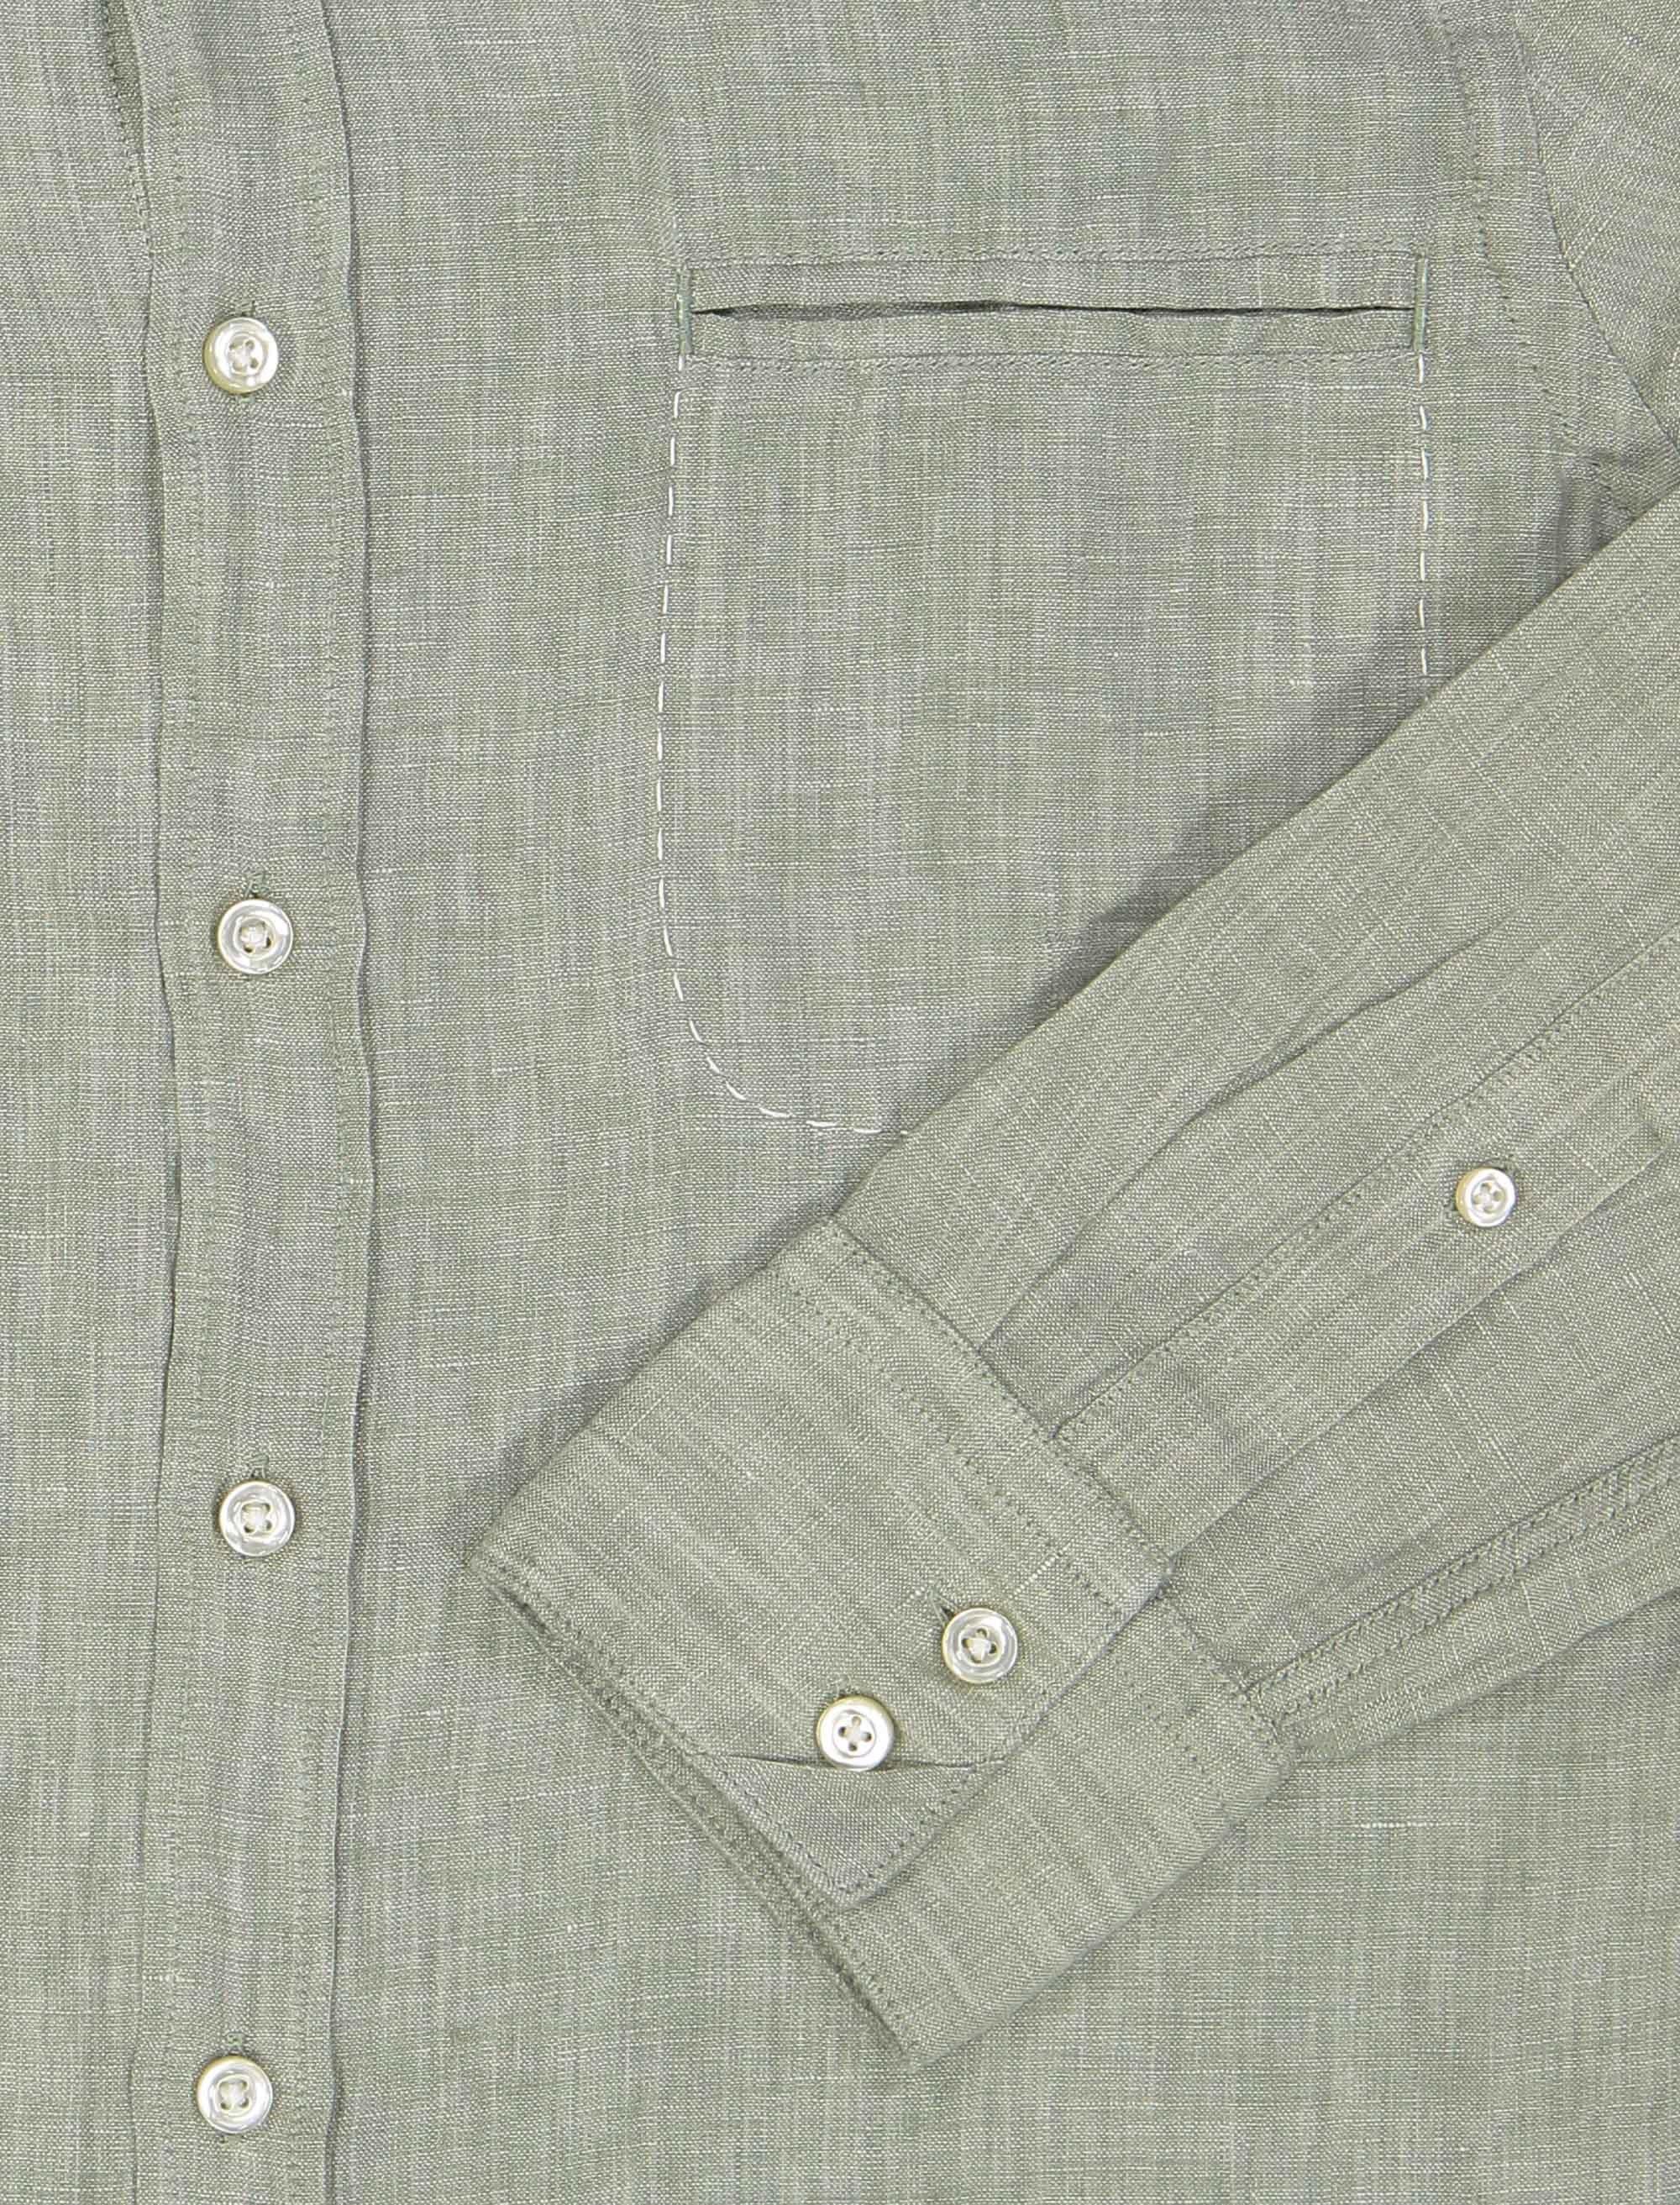 پیراهن آستین بلند مردانه Classy_1 - باس اورنج - سبز روشن  - 7